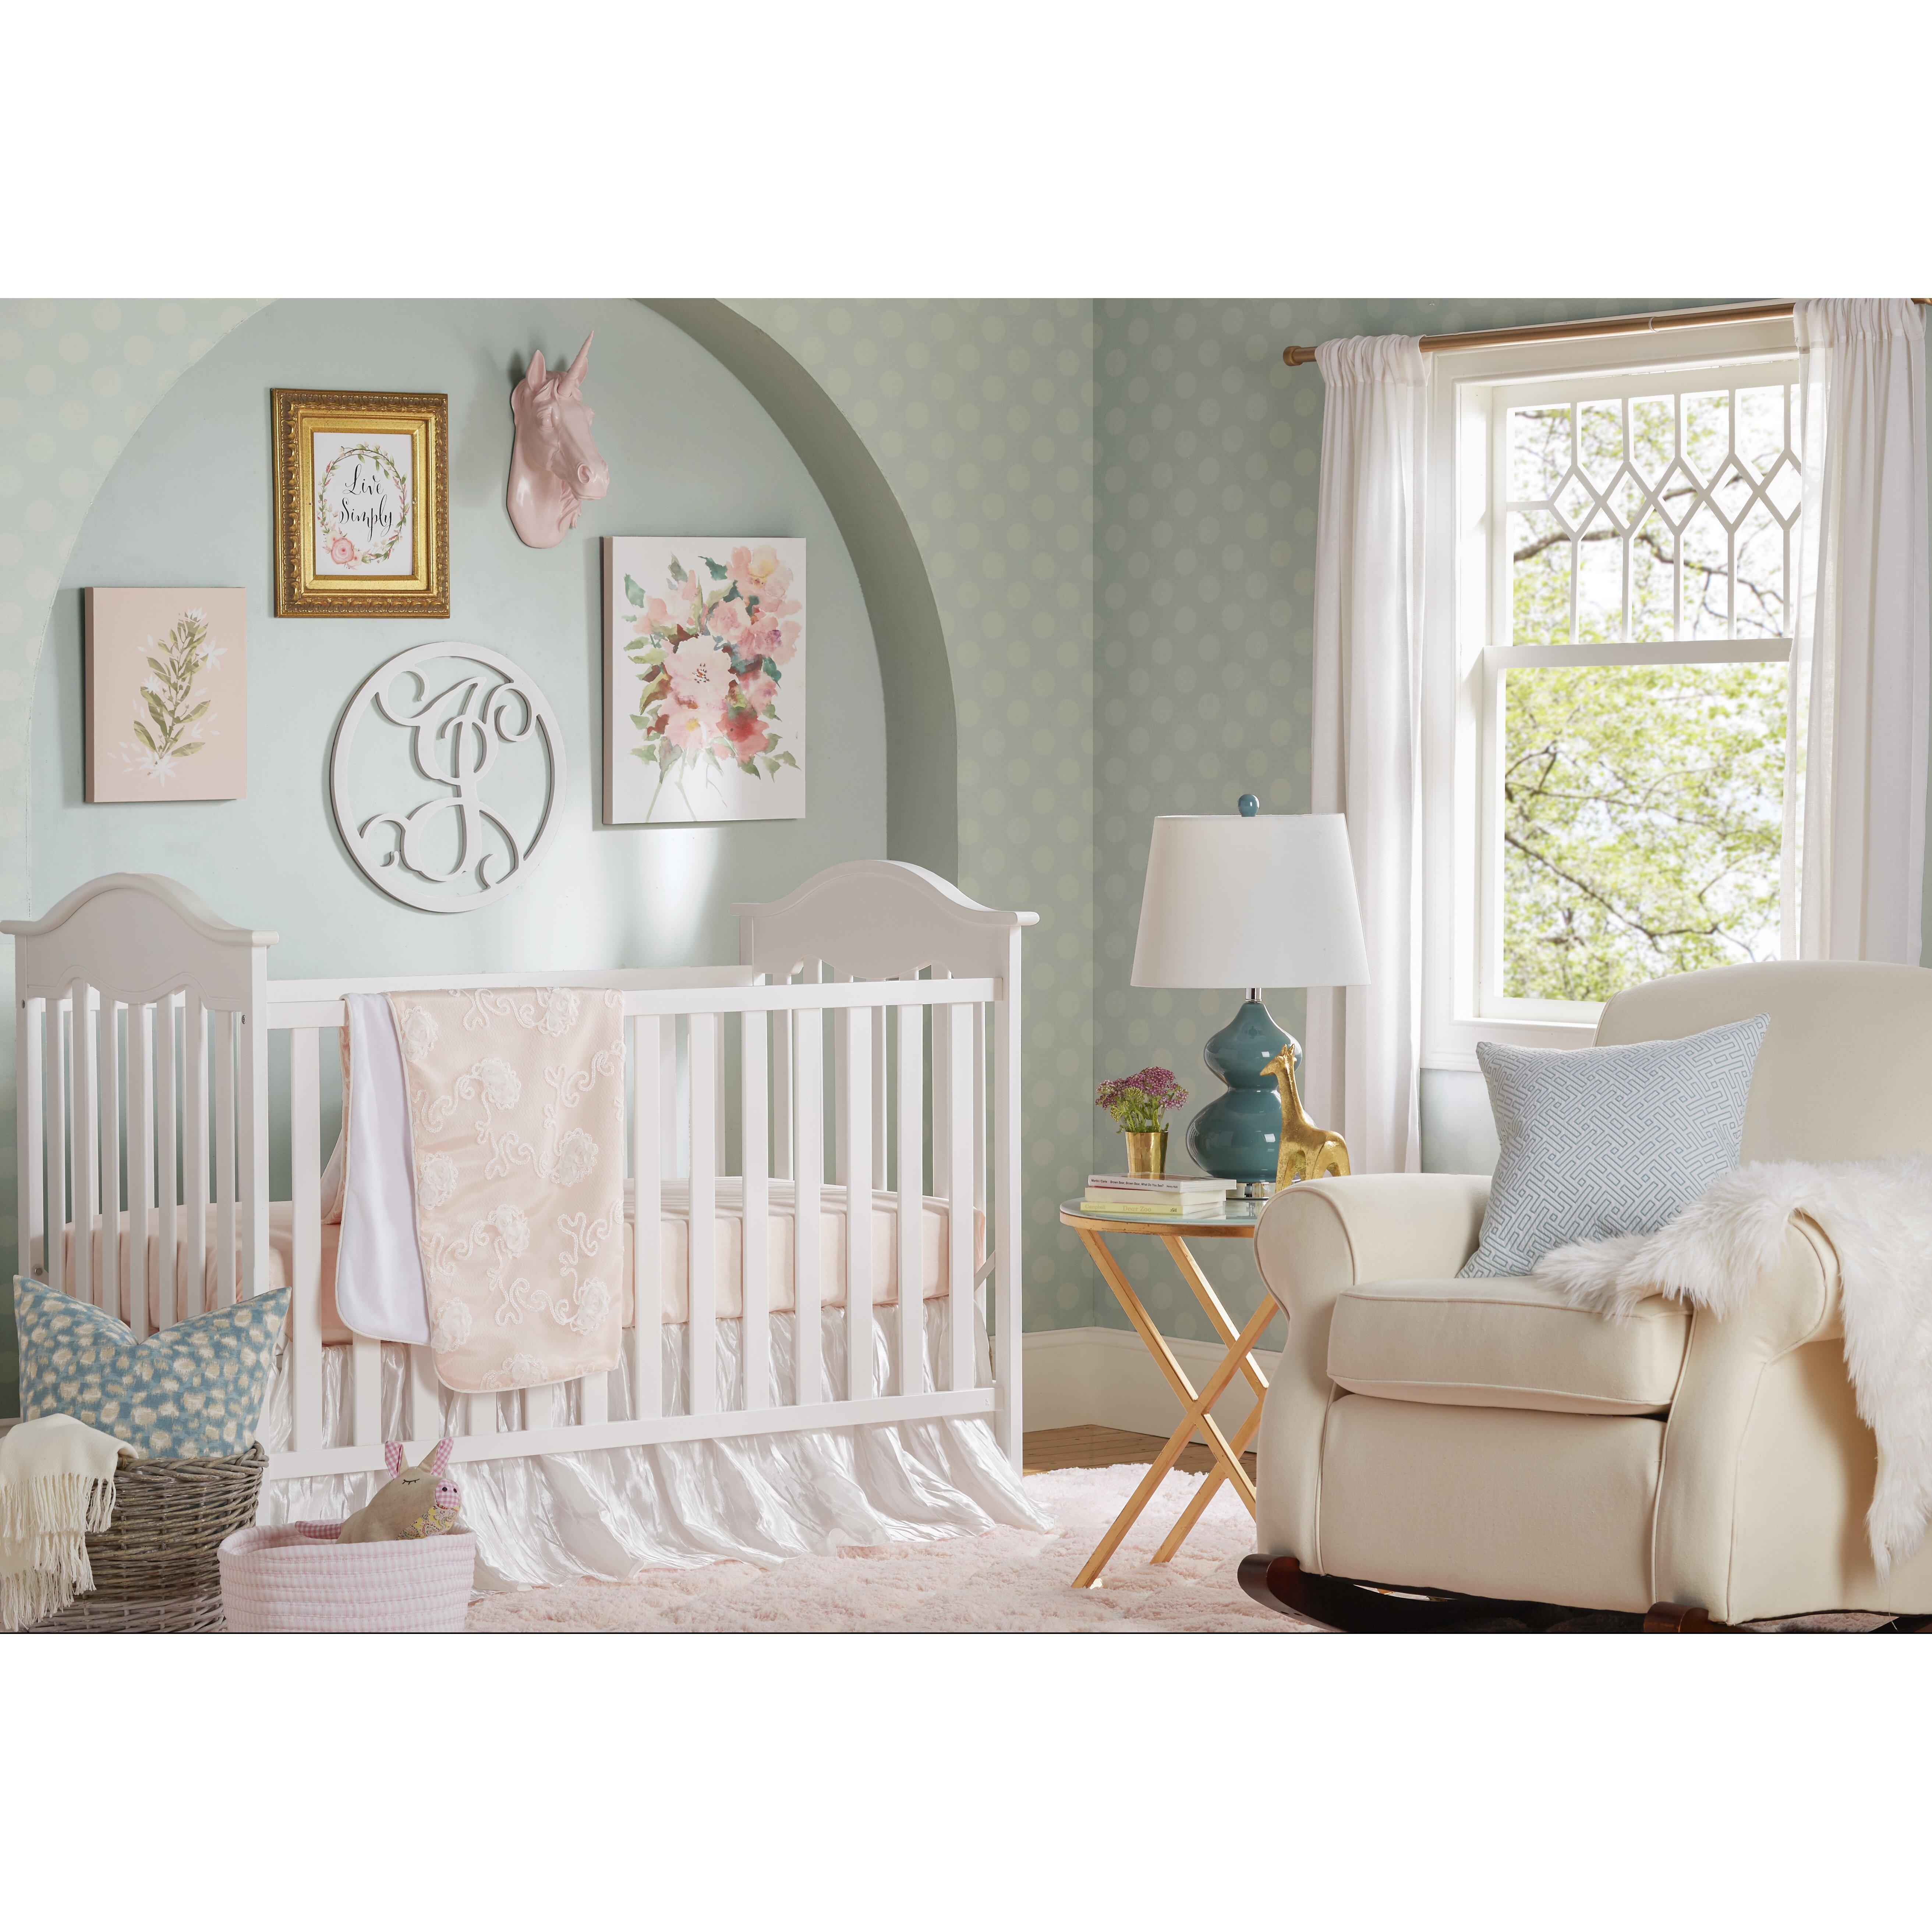 Adalat 60 oros.doc - Baby Crib Vs Cot Lil Princess 3 Piece Crib Bedding Set